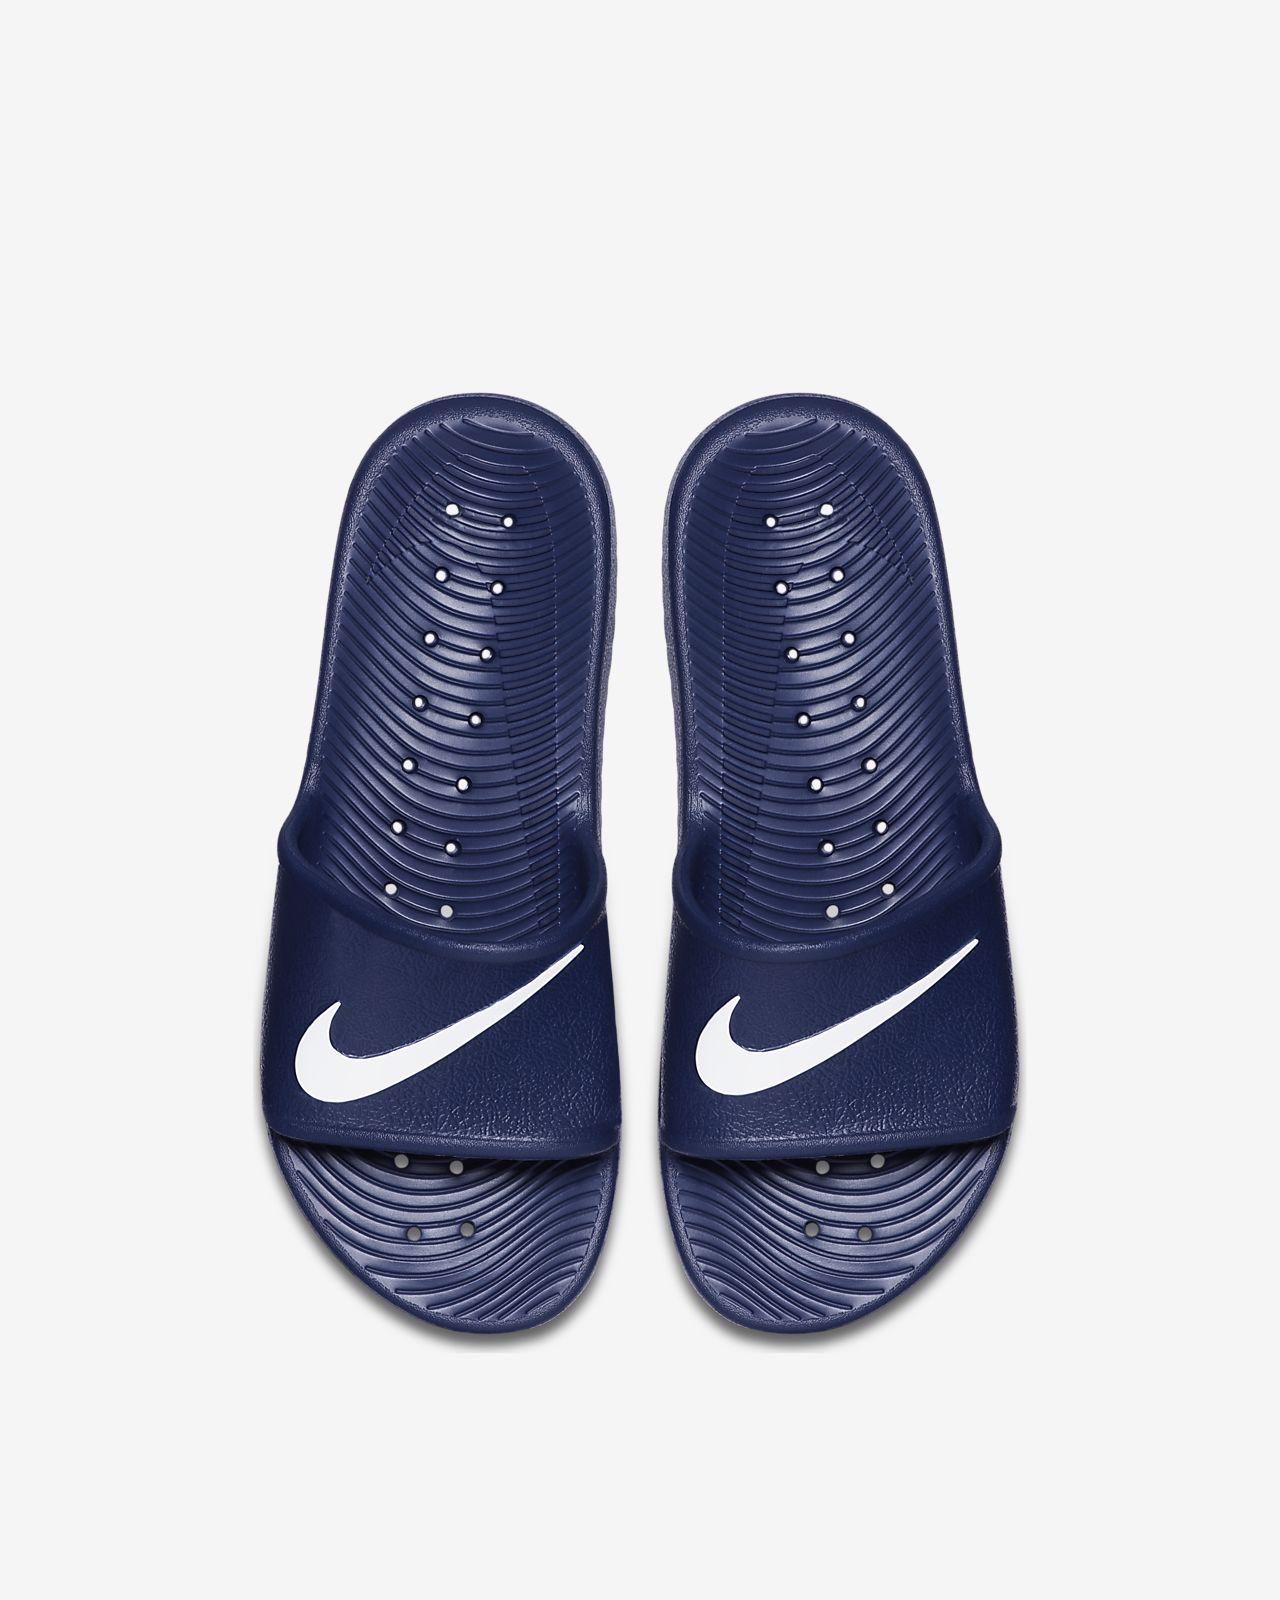 Nike Kawa Shower Herren-Badeslipper